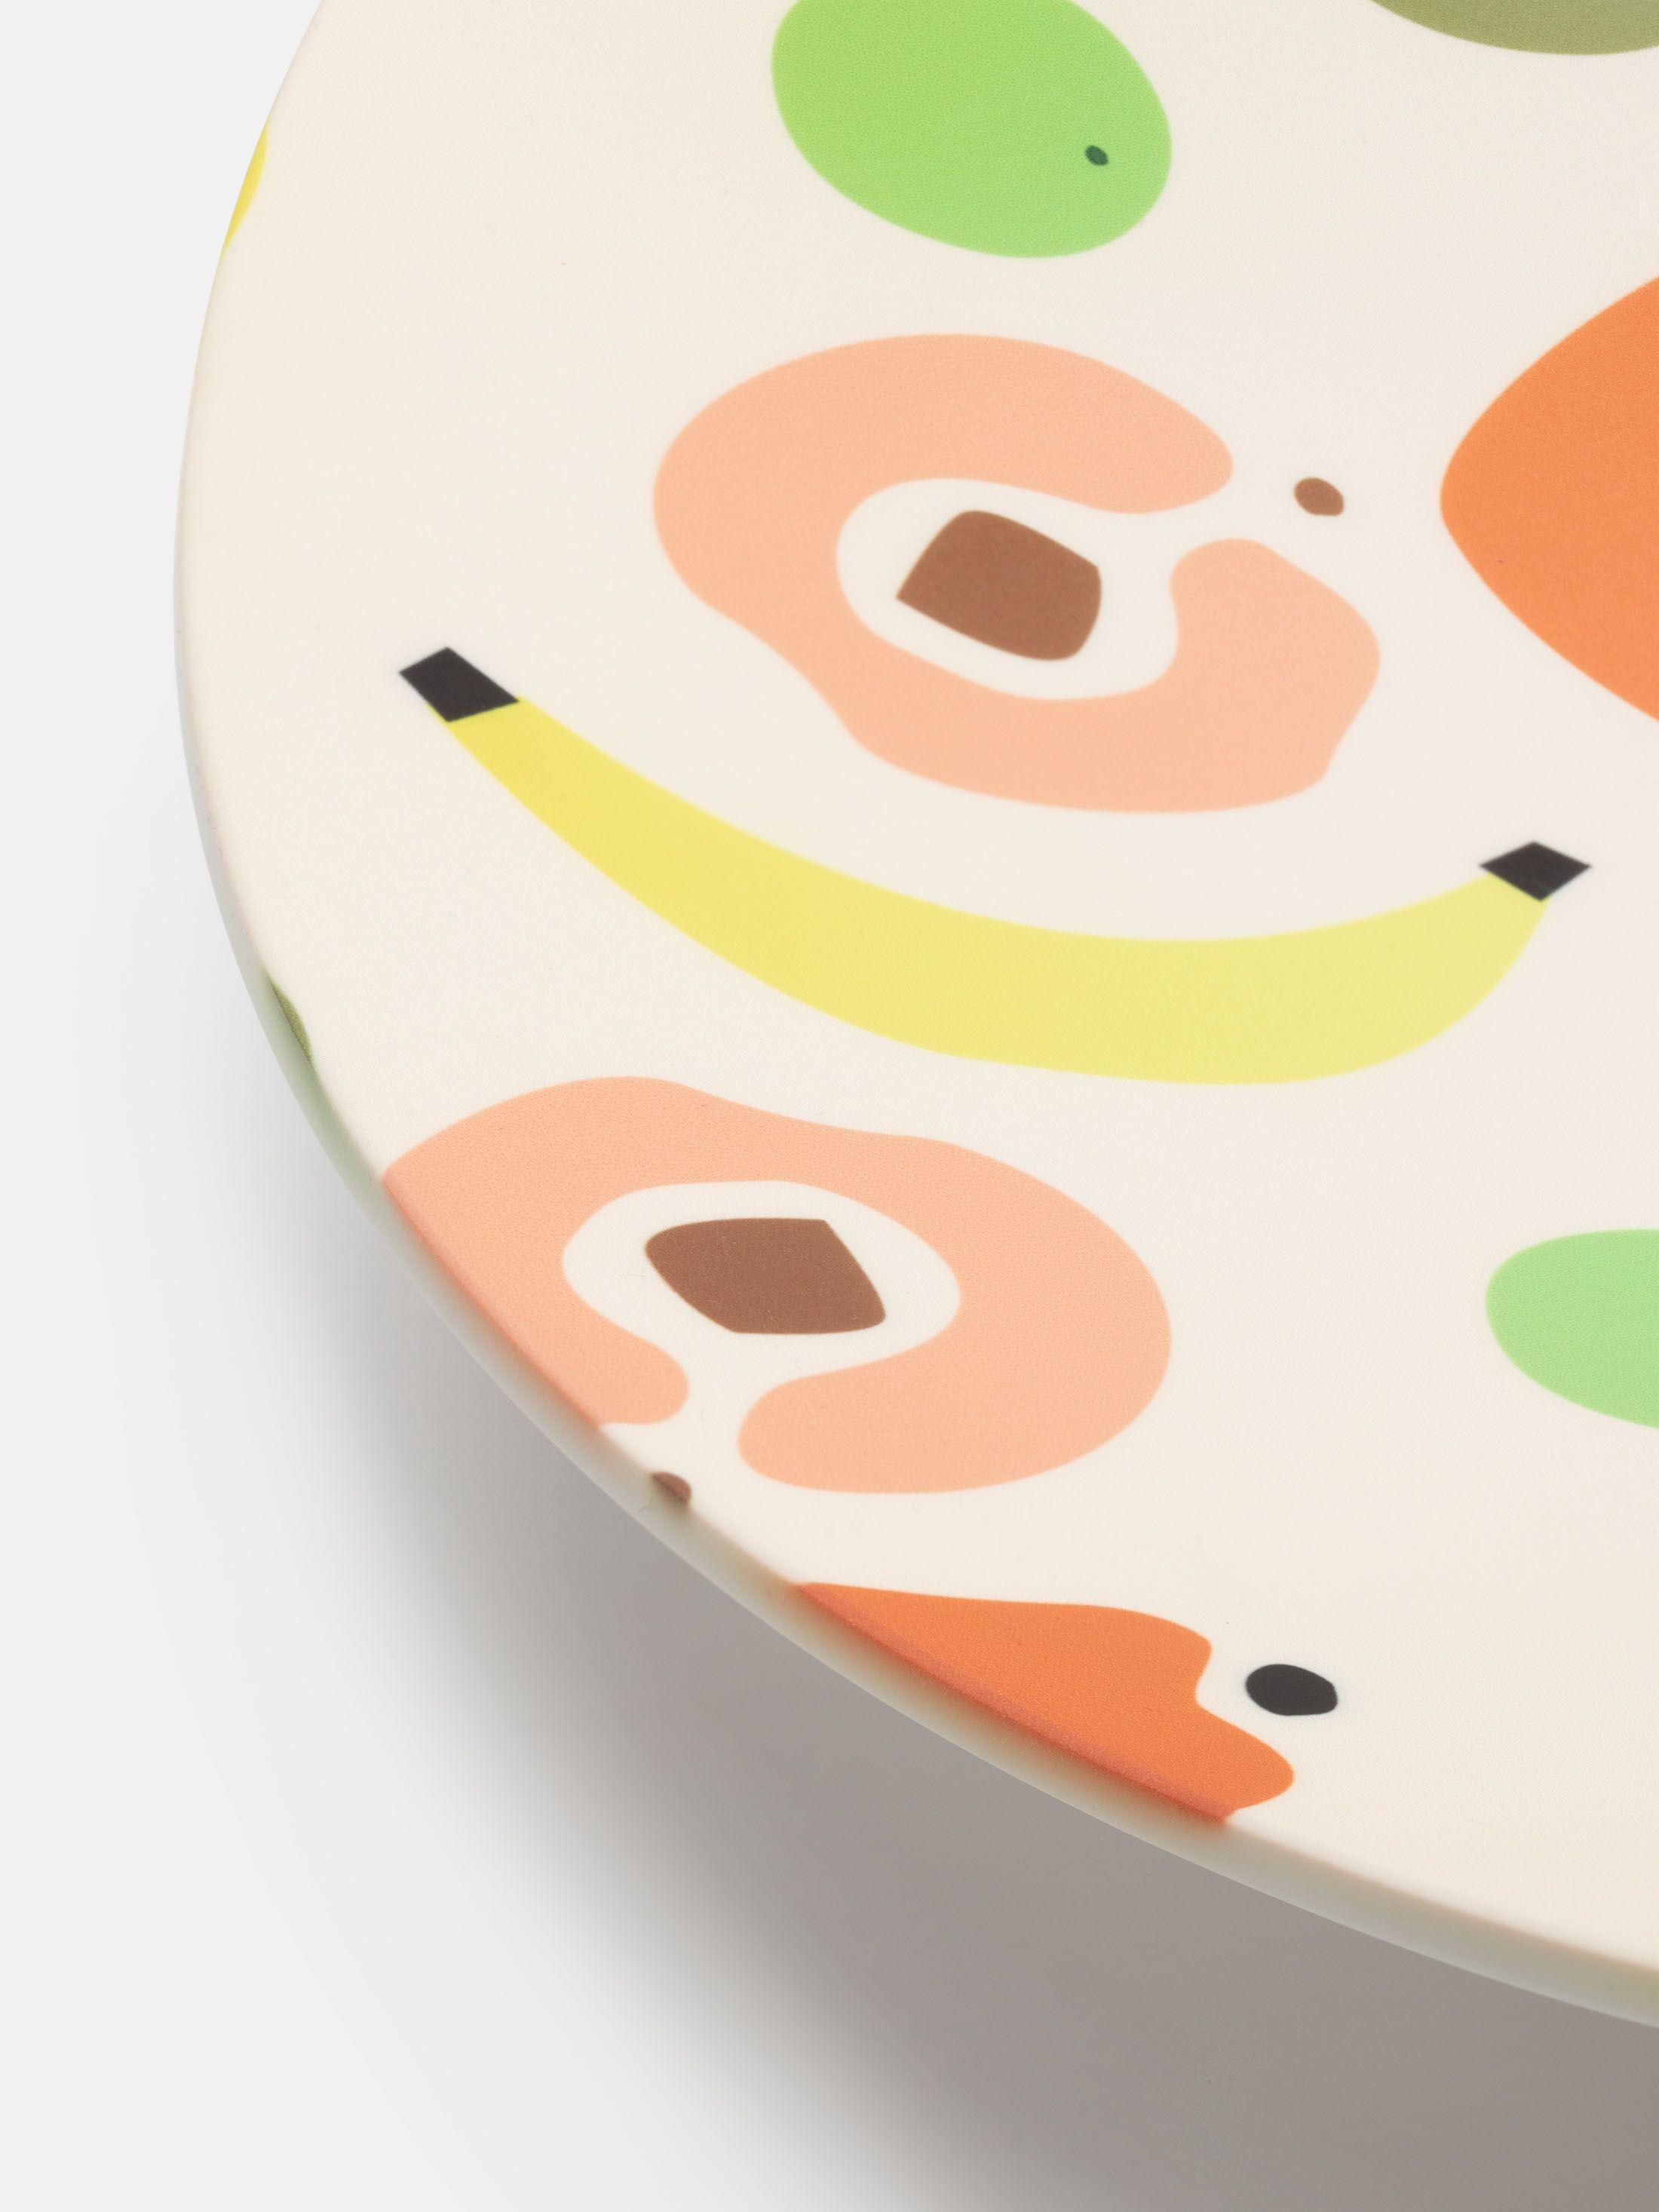 customized bowls